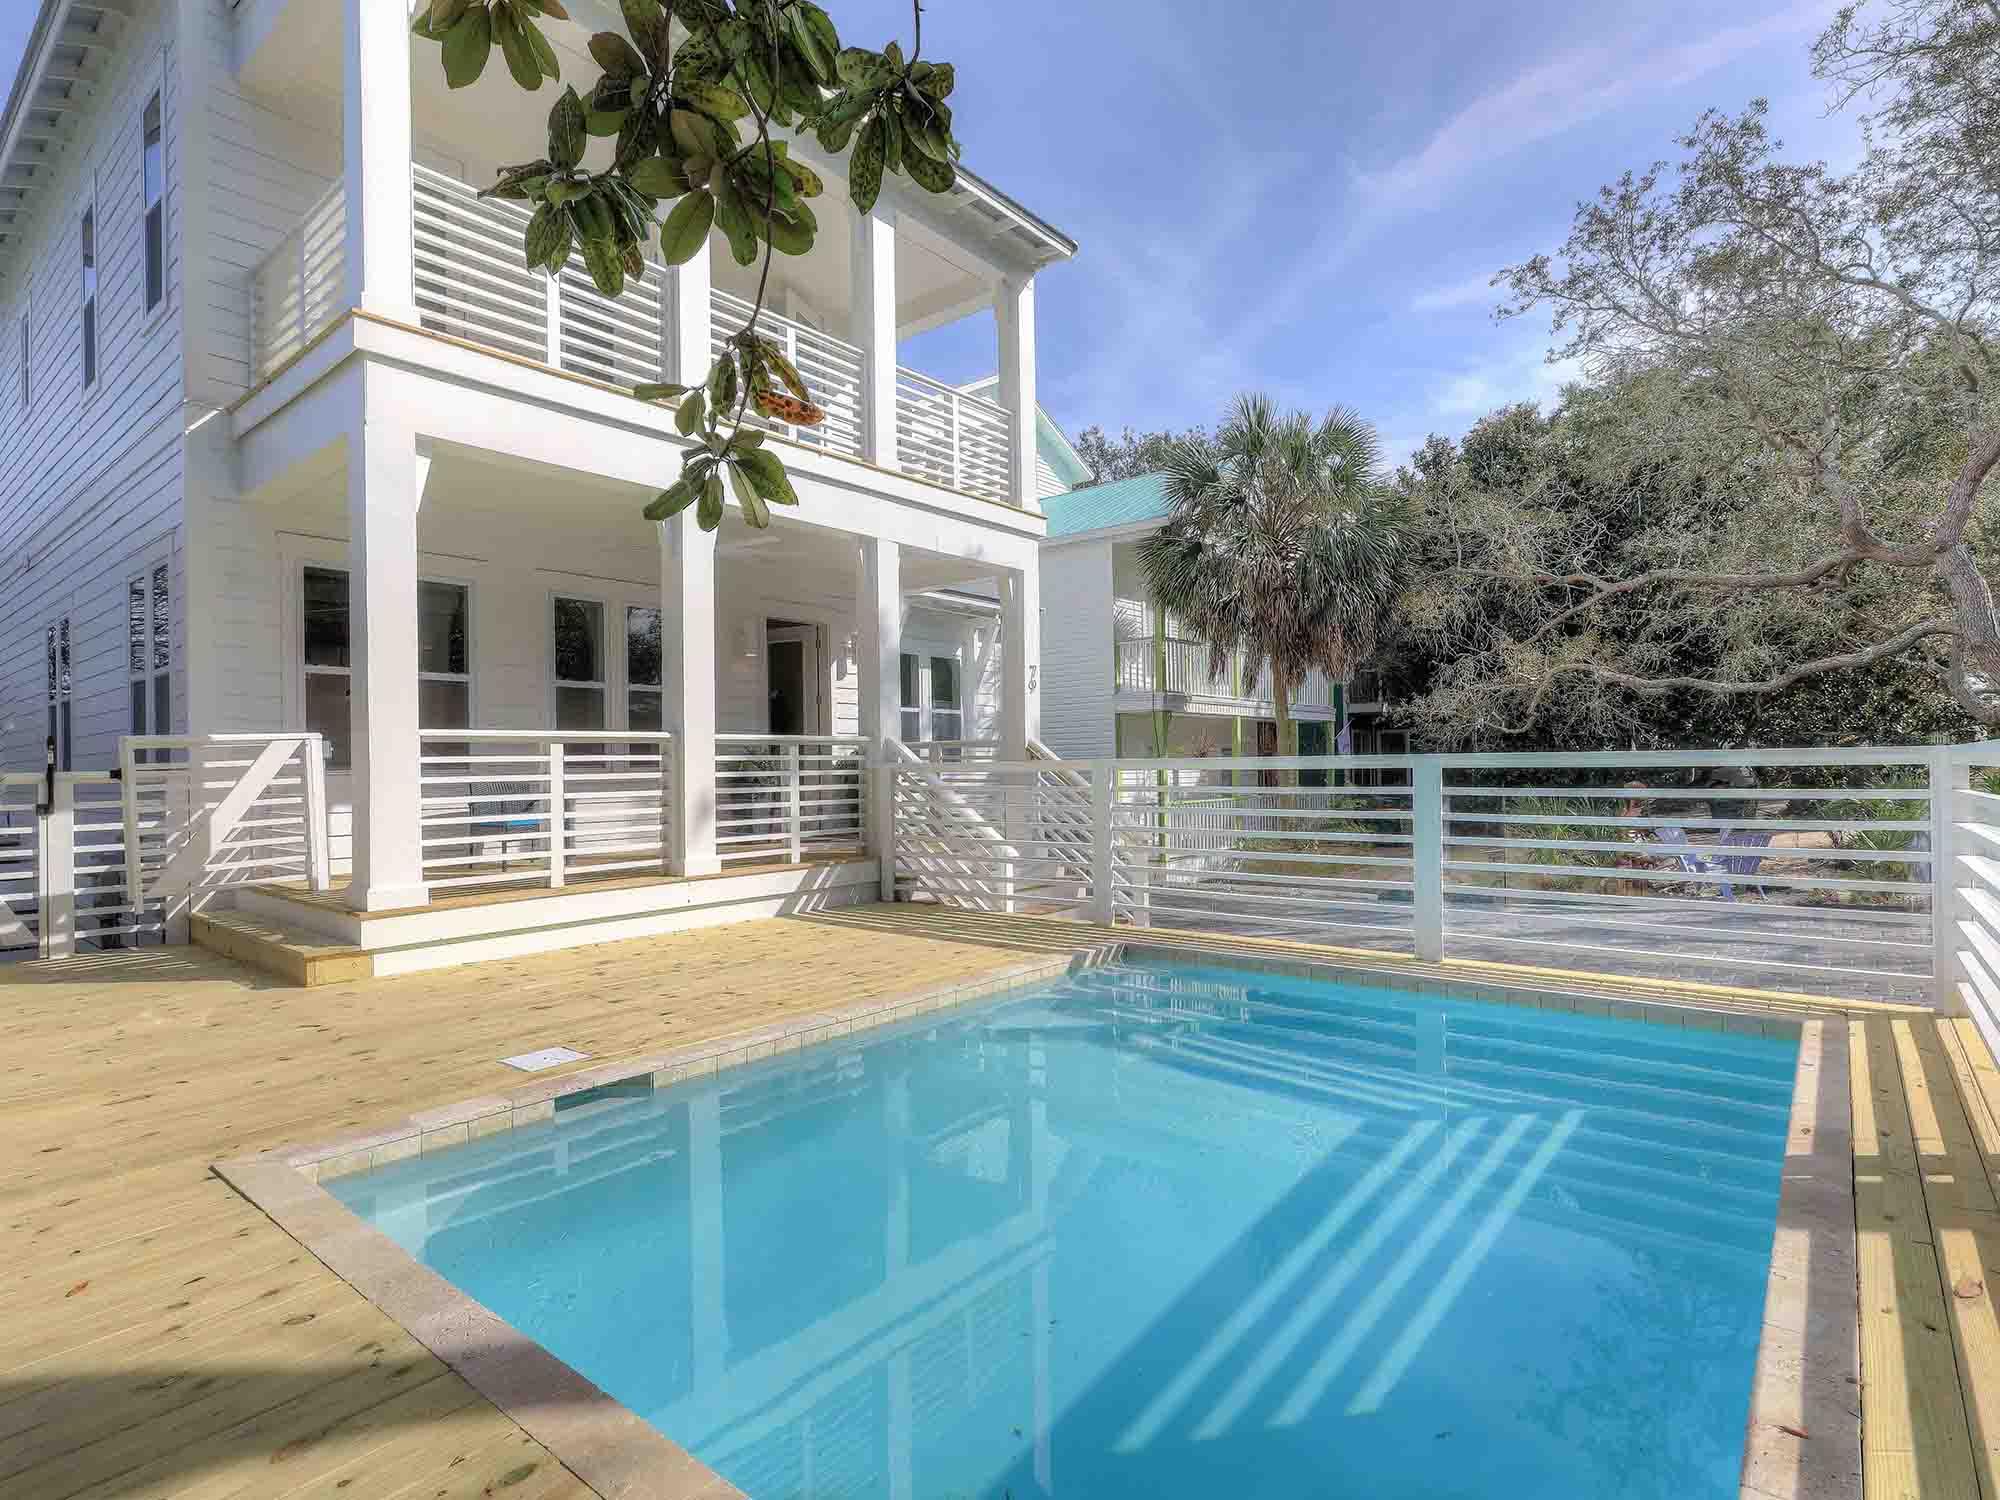 Vacation Home in Destin, Florida